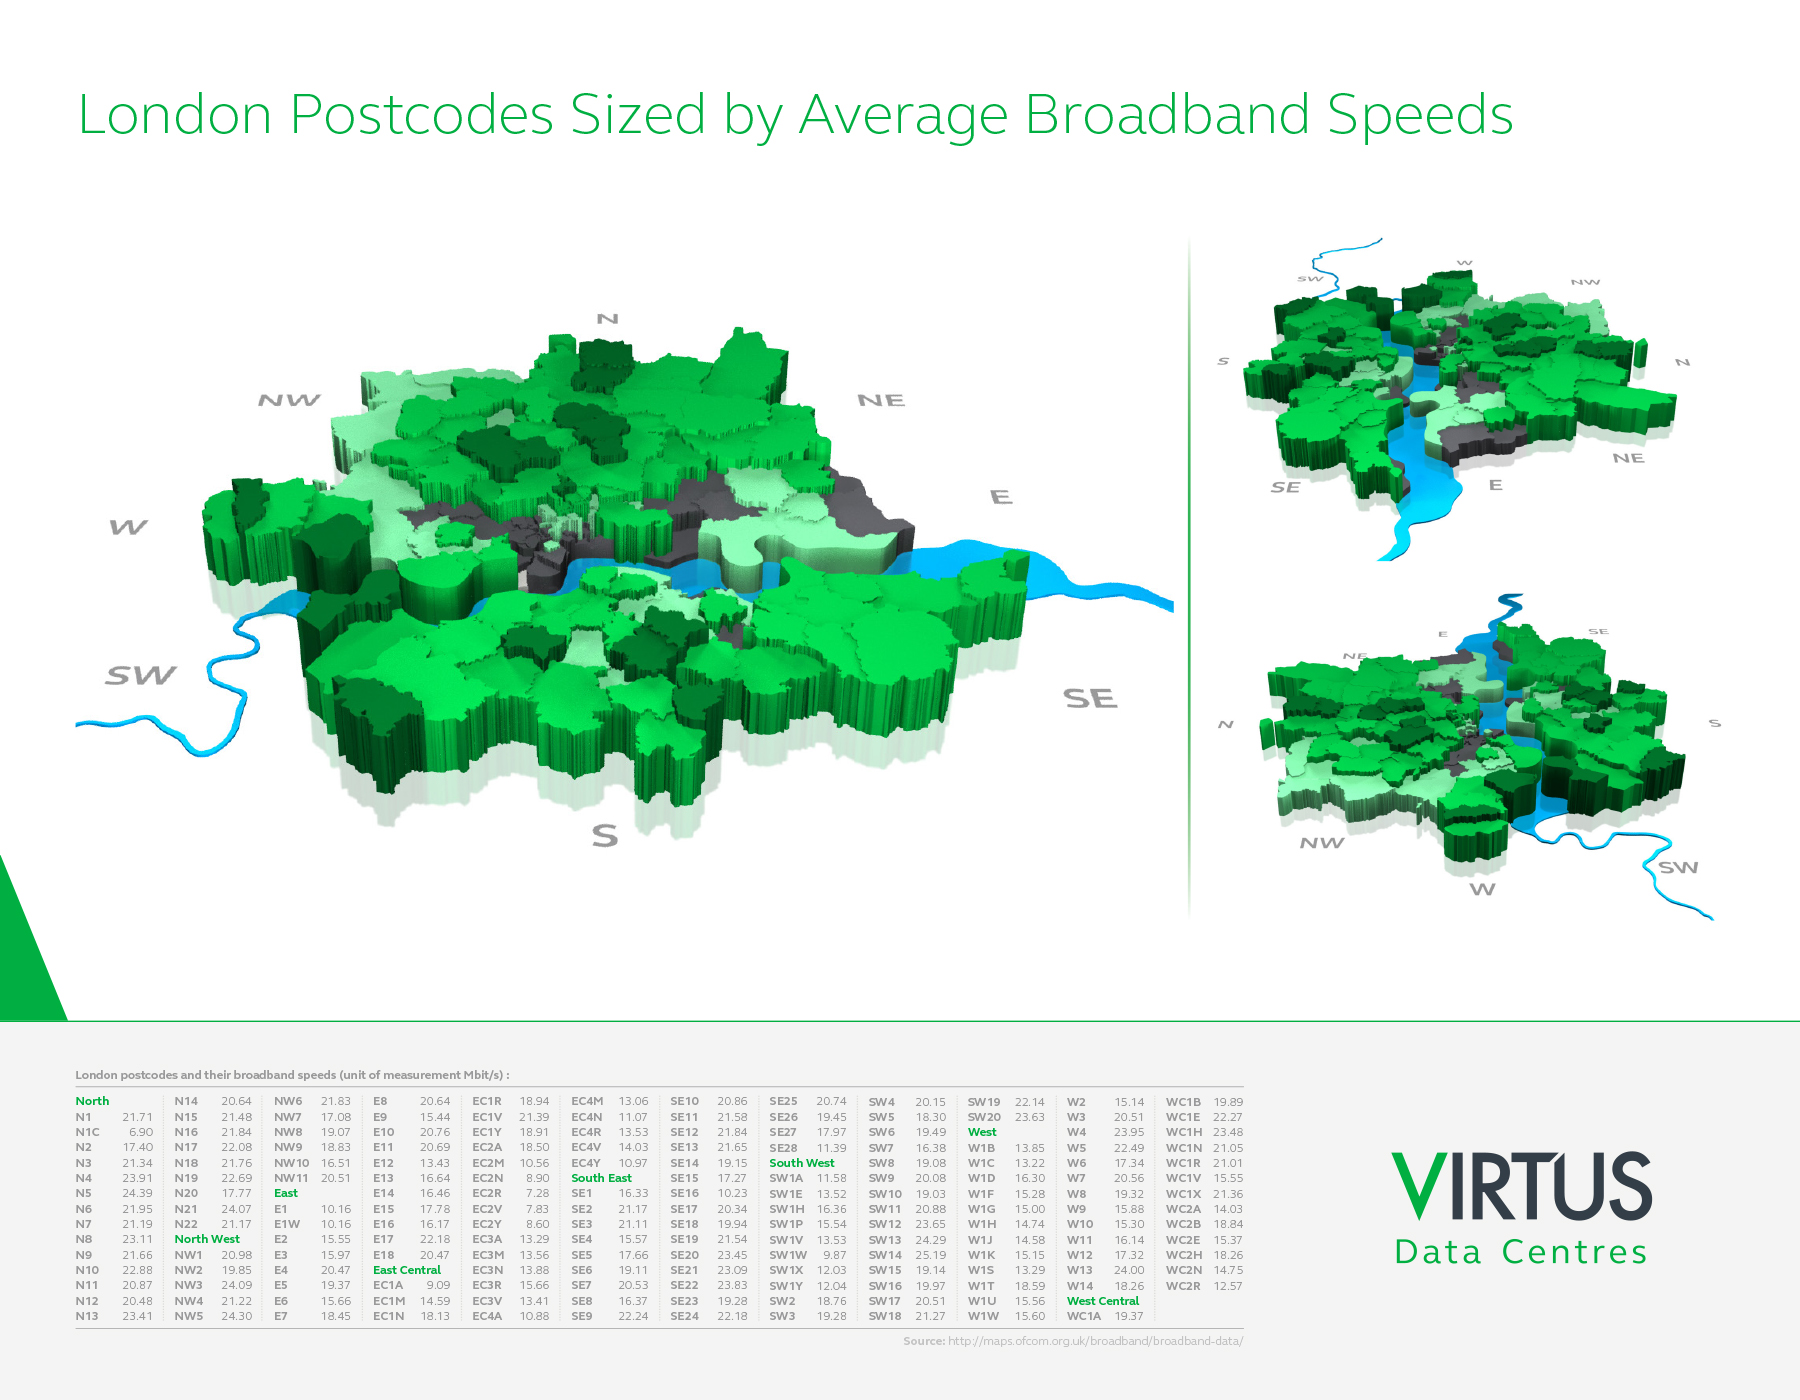 London Postcodes Sized by Average Broadband Speeds